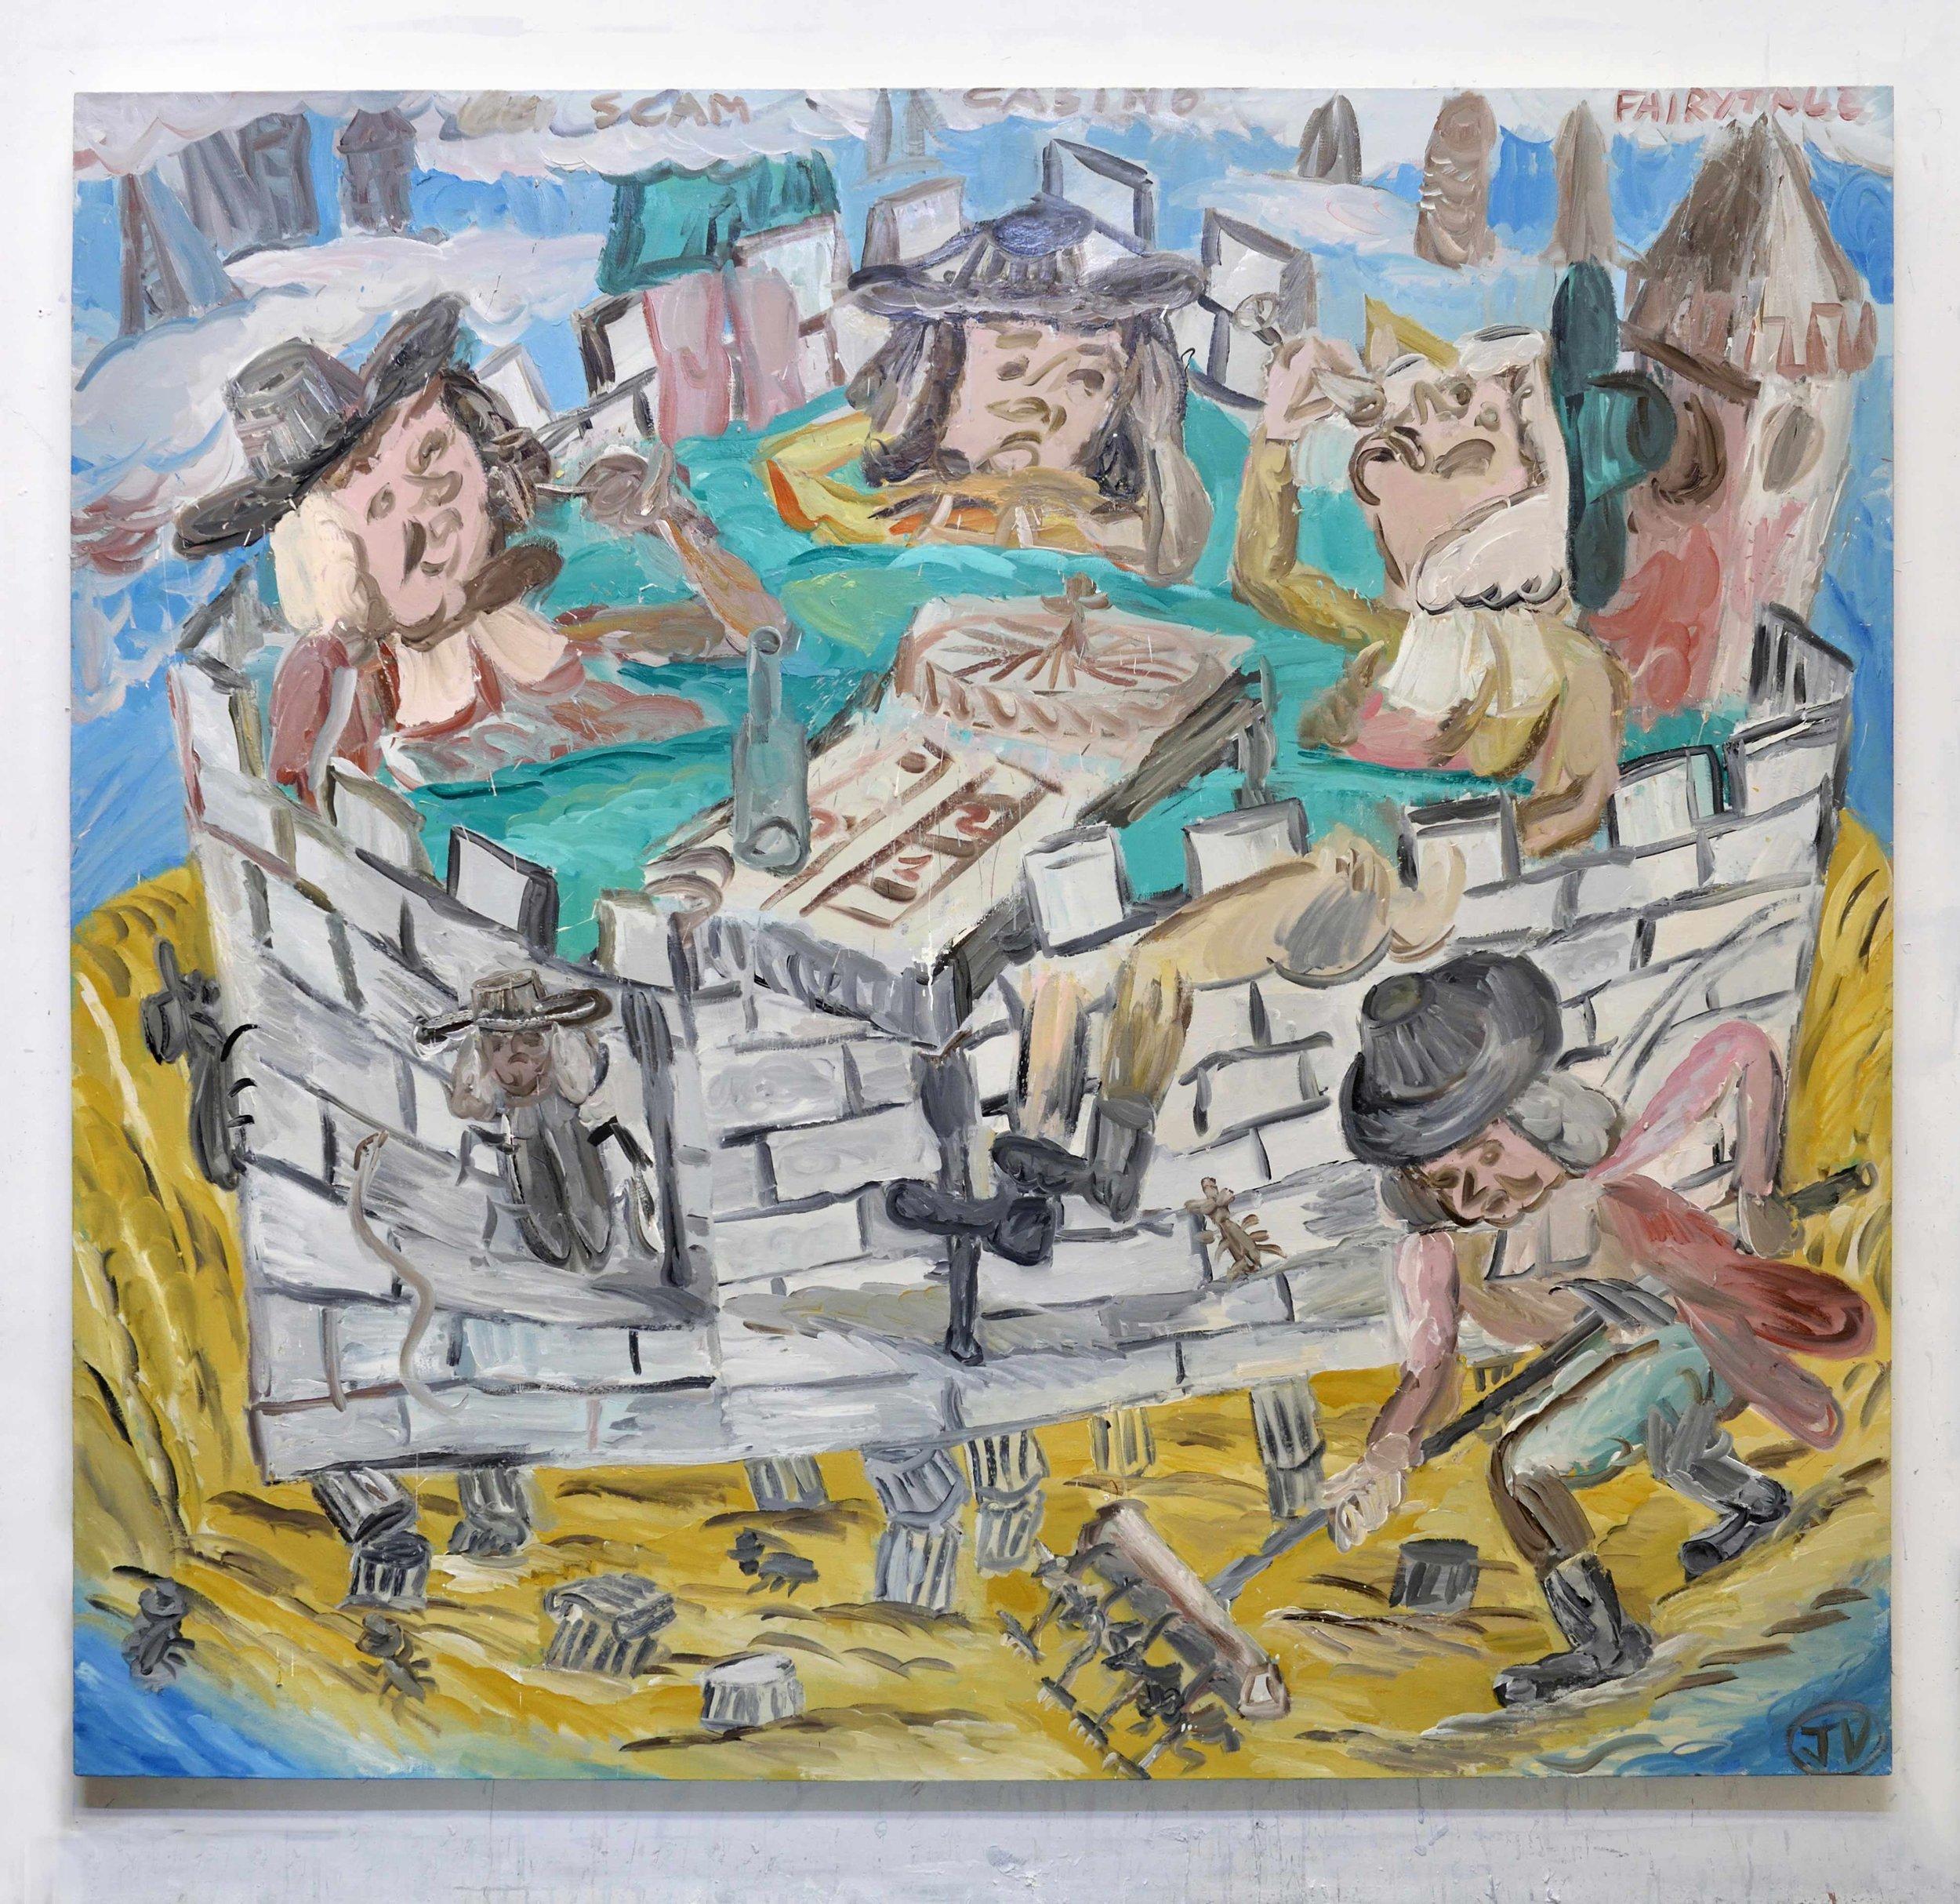 'The Castle (Scam Casino Fairytale)' 2017   Oil on linen. 185 x 200 cm